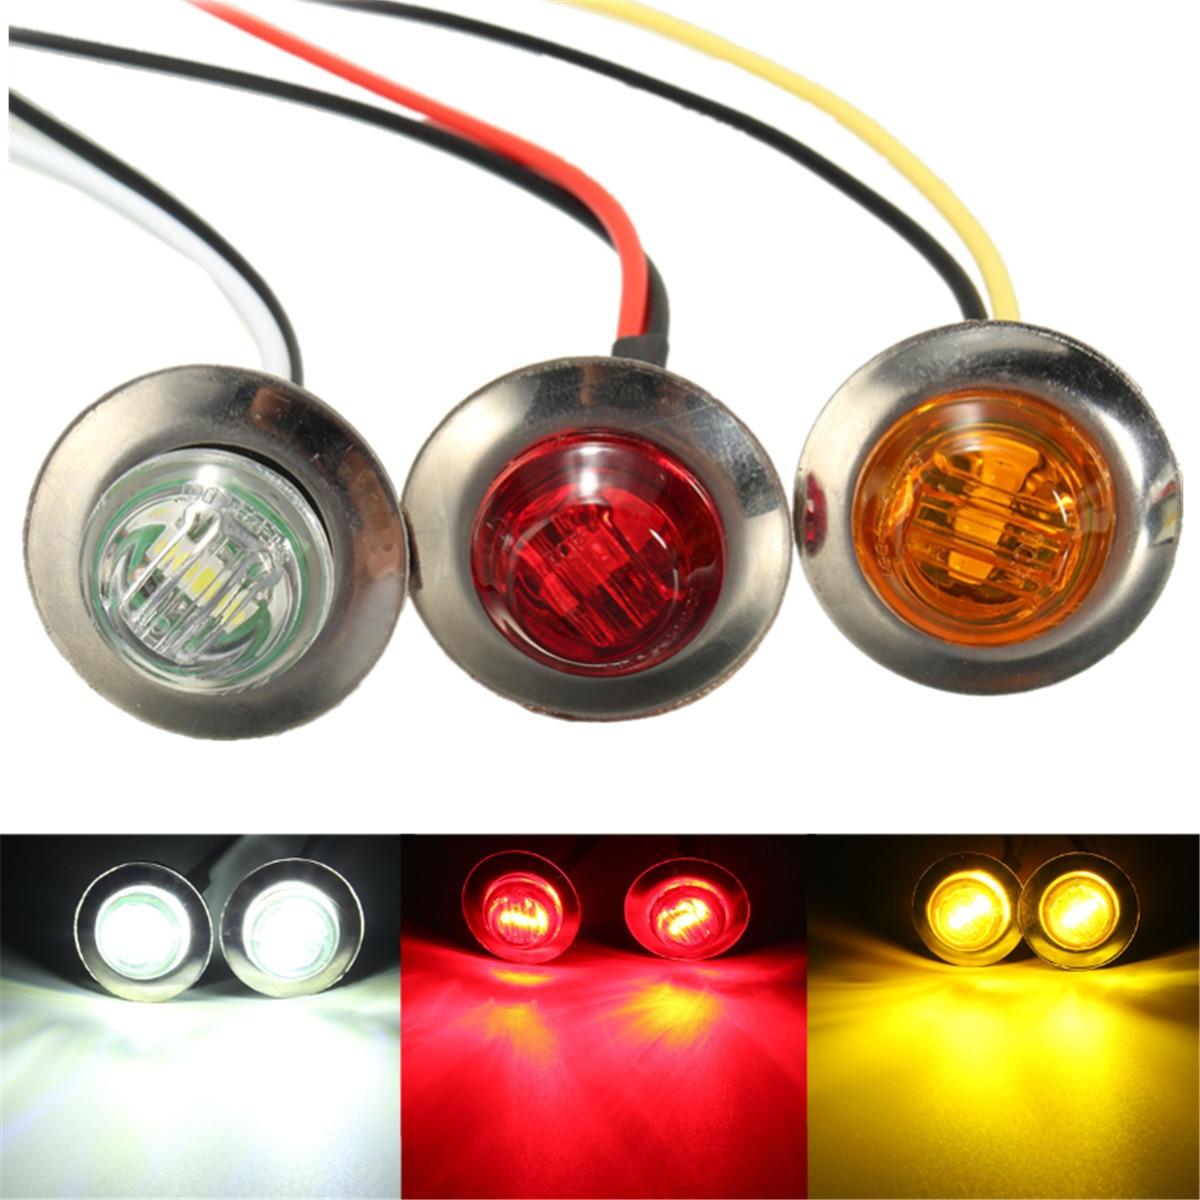 Pair 12V LED Side Marker Turn Signal Light Clearance Indicator Lamp Amber Red White For Truck Trailer Caravan Bus